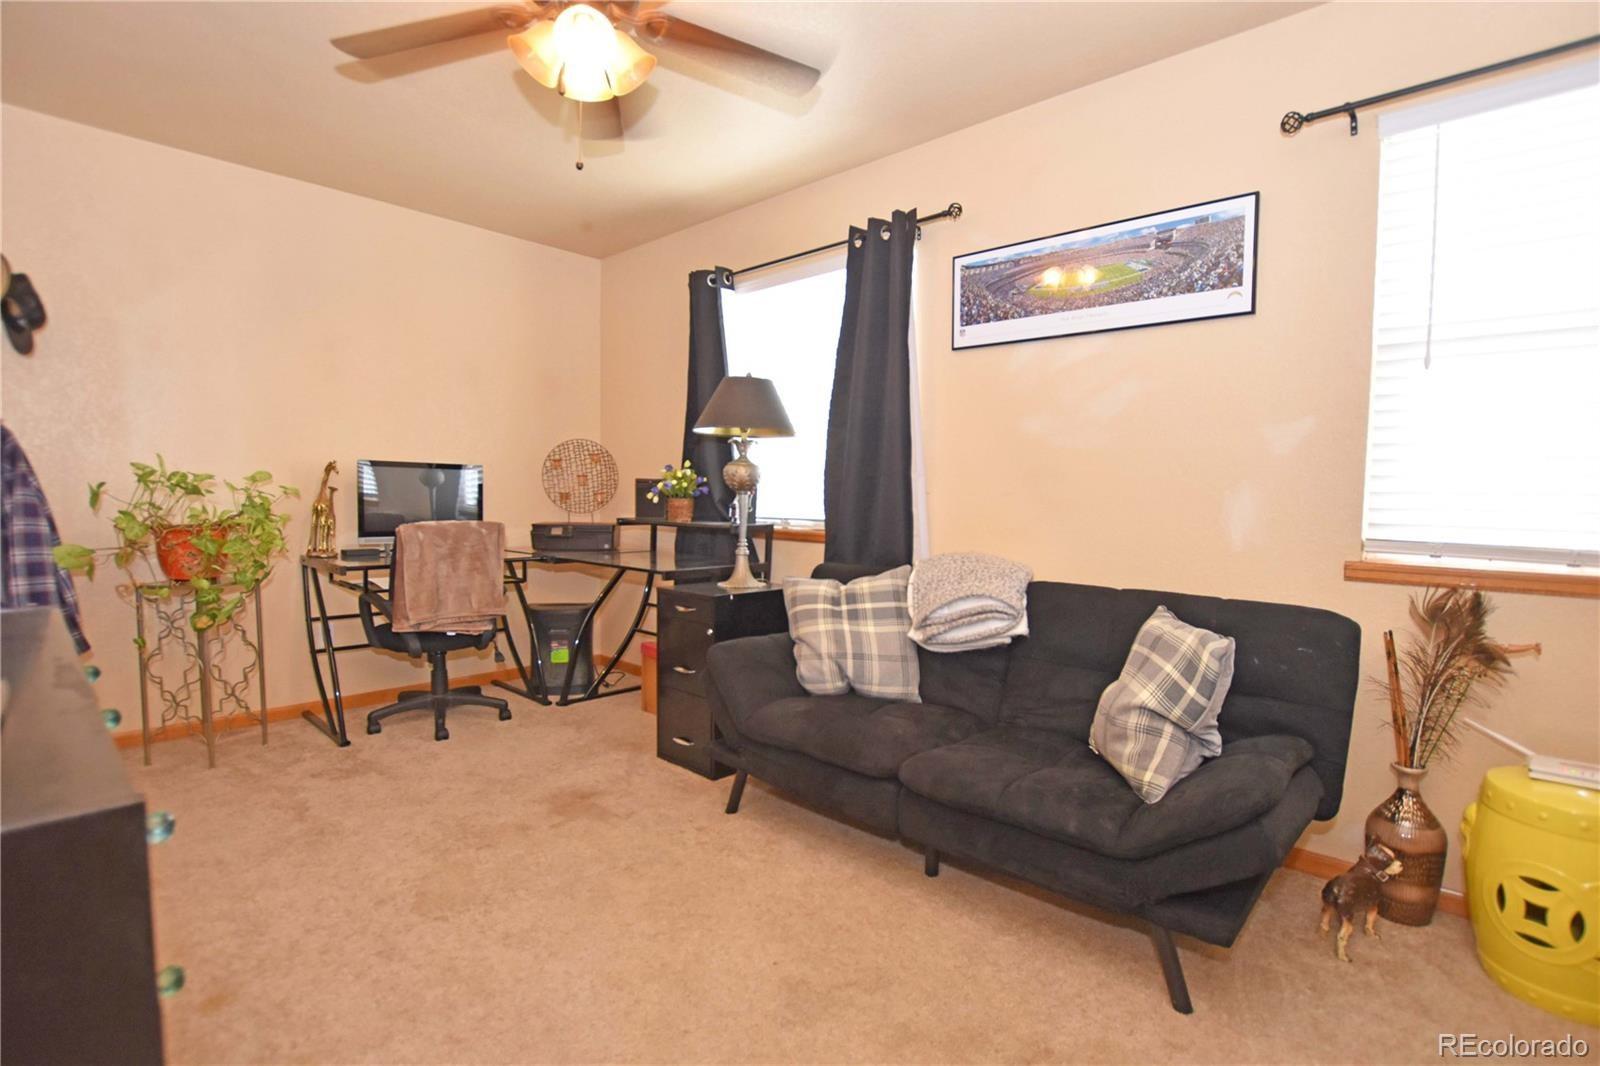 MLS# 9206879 - 26 - 3924 Eagles Nest Drive, Evans, CO 80620